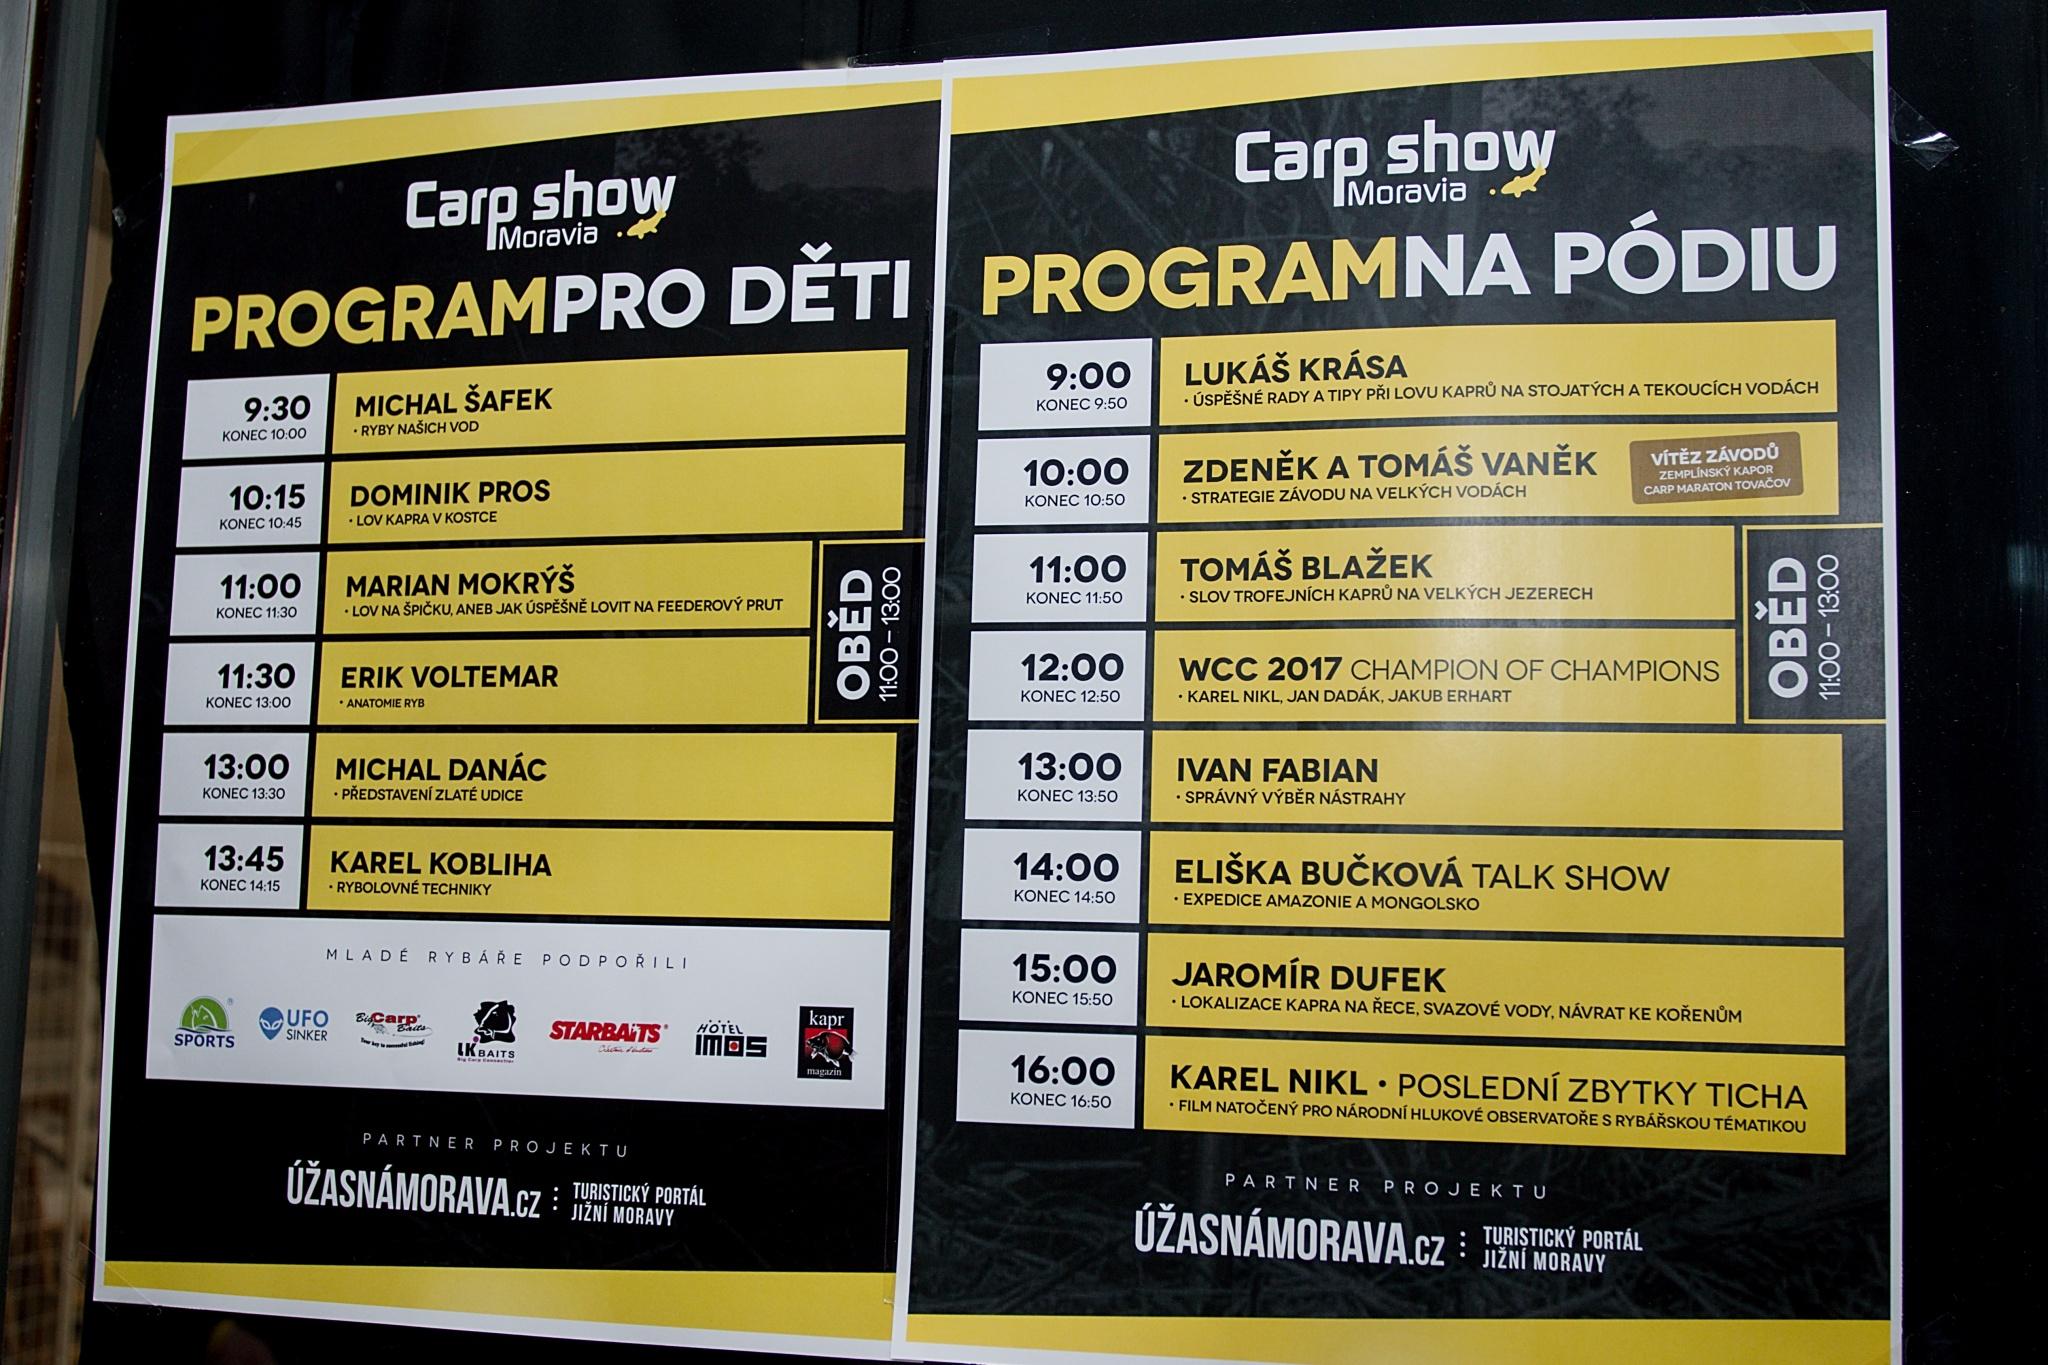 Carp Show Moravia – Fotoreport